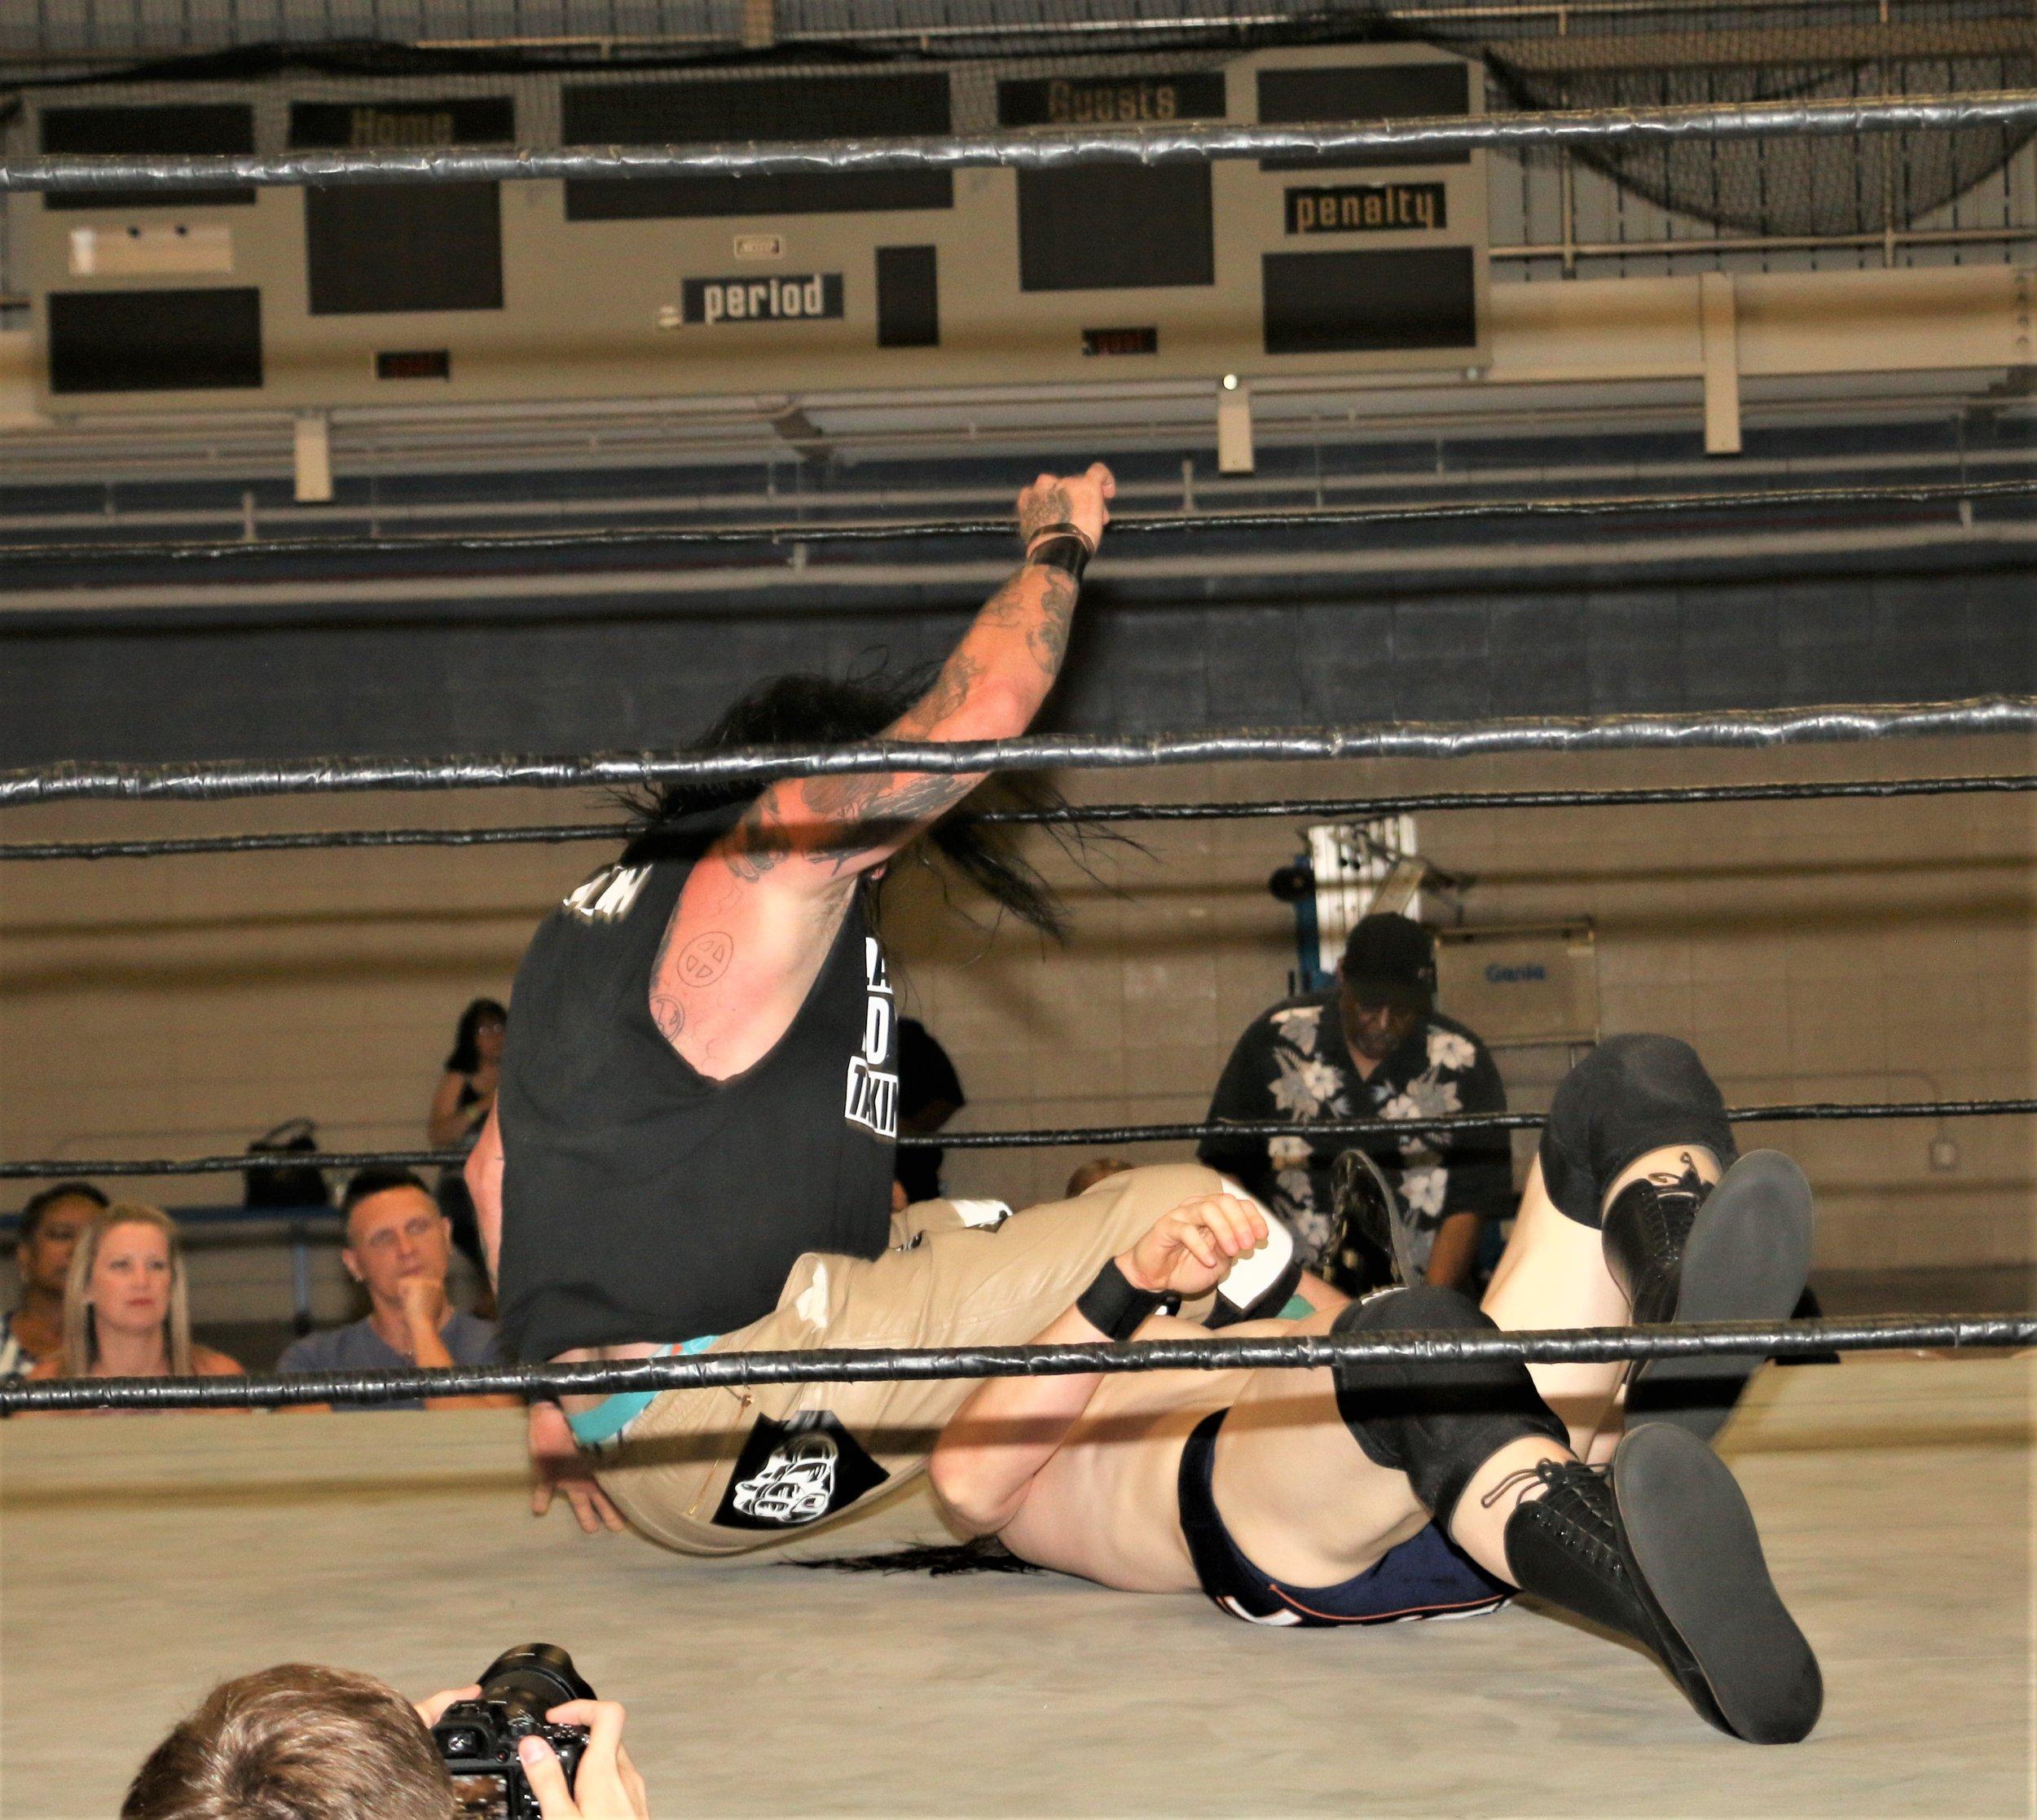 J Ca$h drops the leg on Logan Lynch.